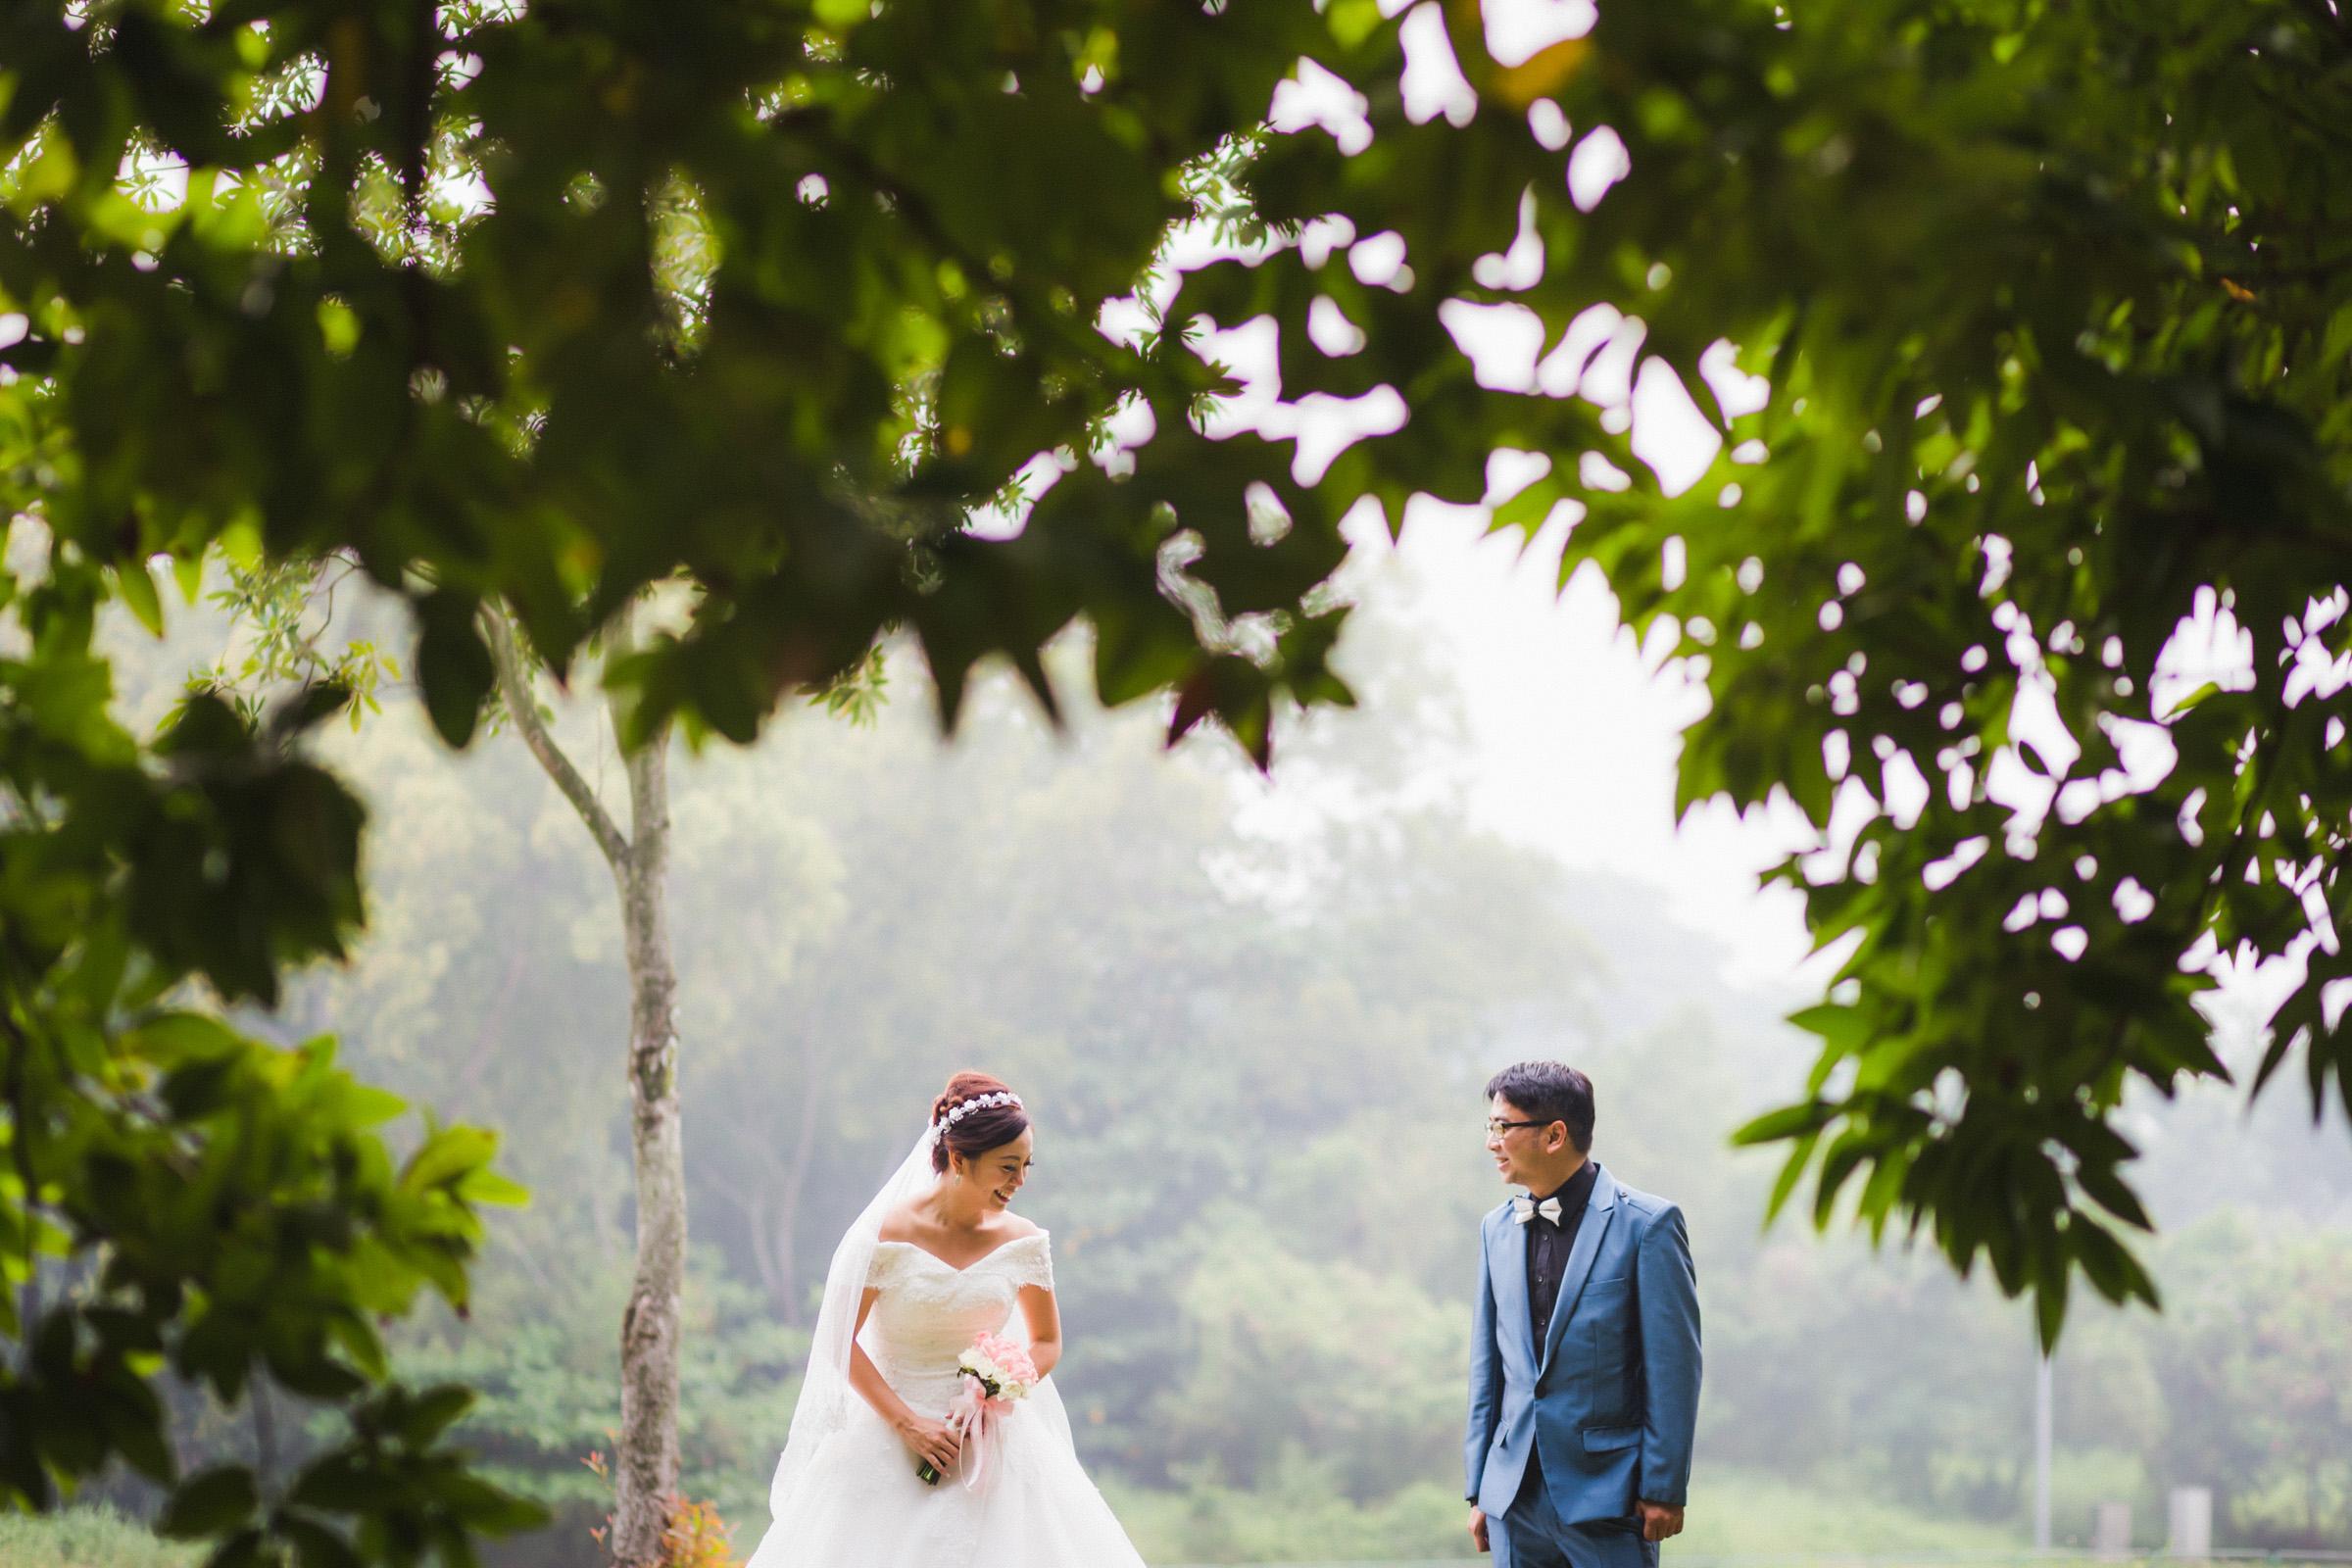 Steven_Jasmine_Wedding_Walldrobe Photography_Wedding shoots_Actual day wedding_Photographer (20)